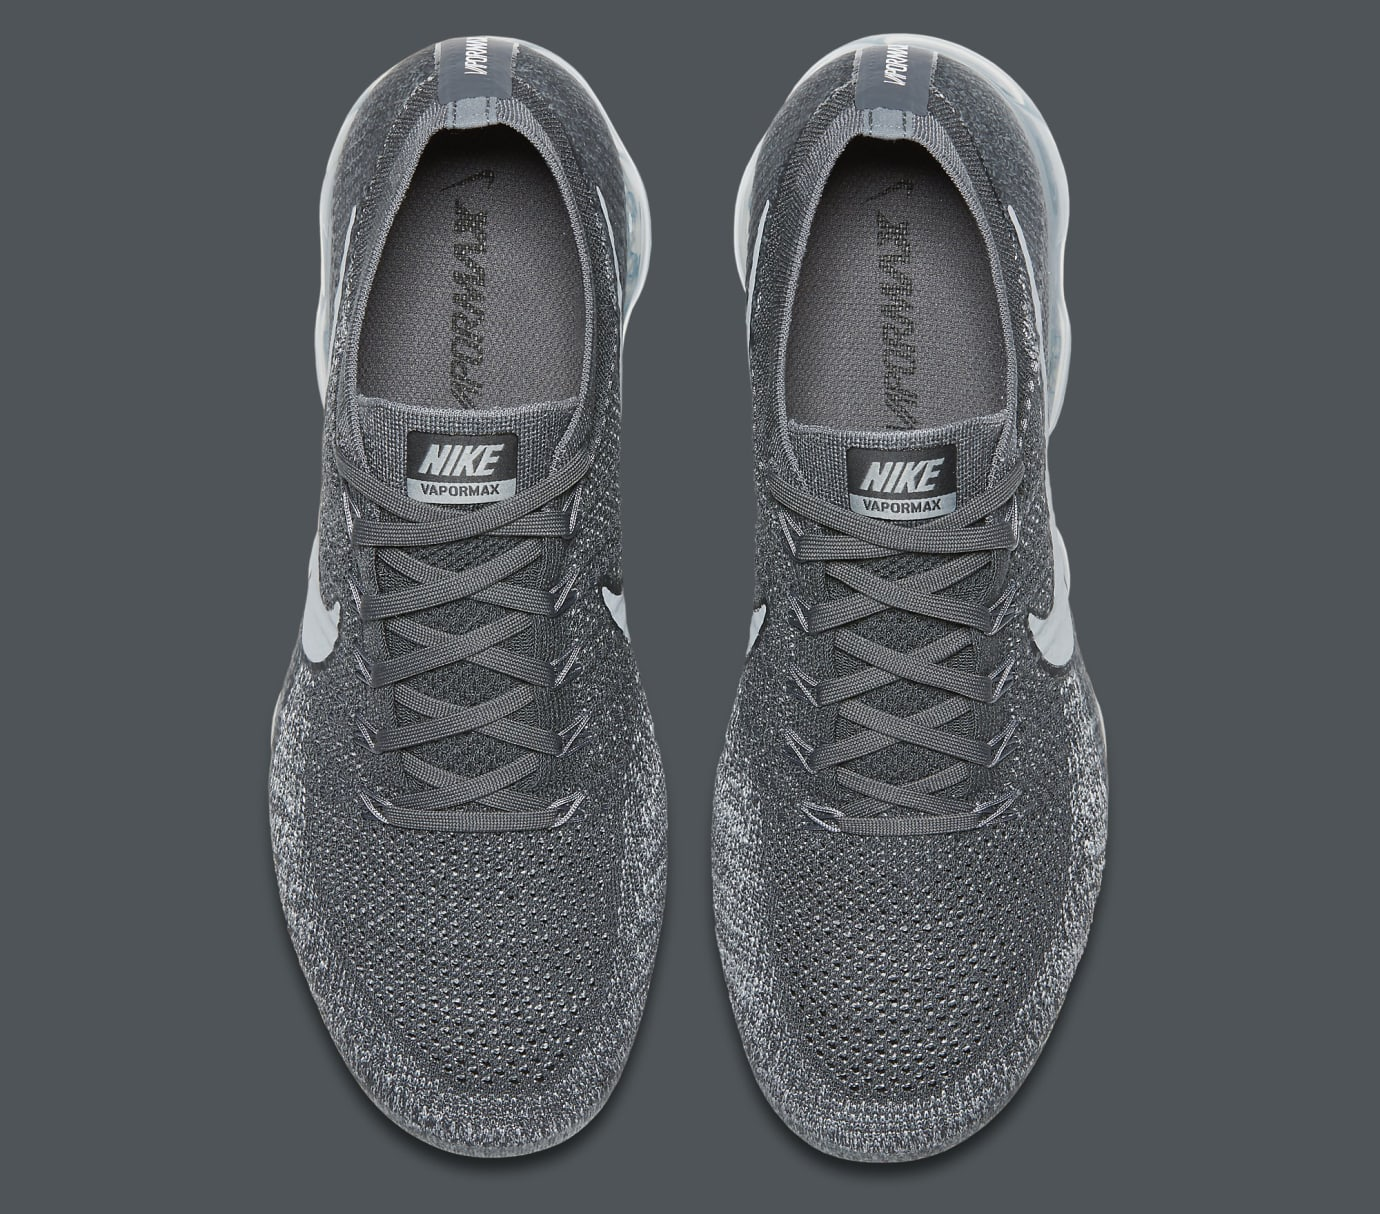 Nike Air VaporMax Dark Grey Pure Platinum 849558-002 Top